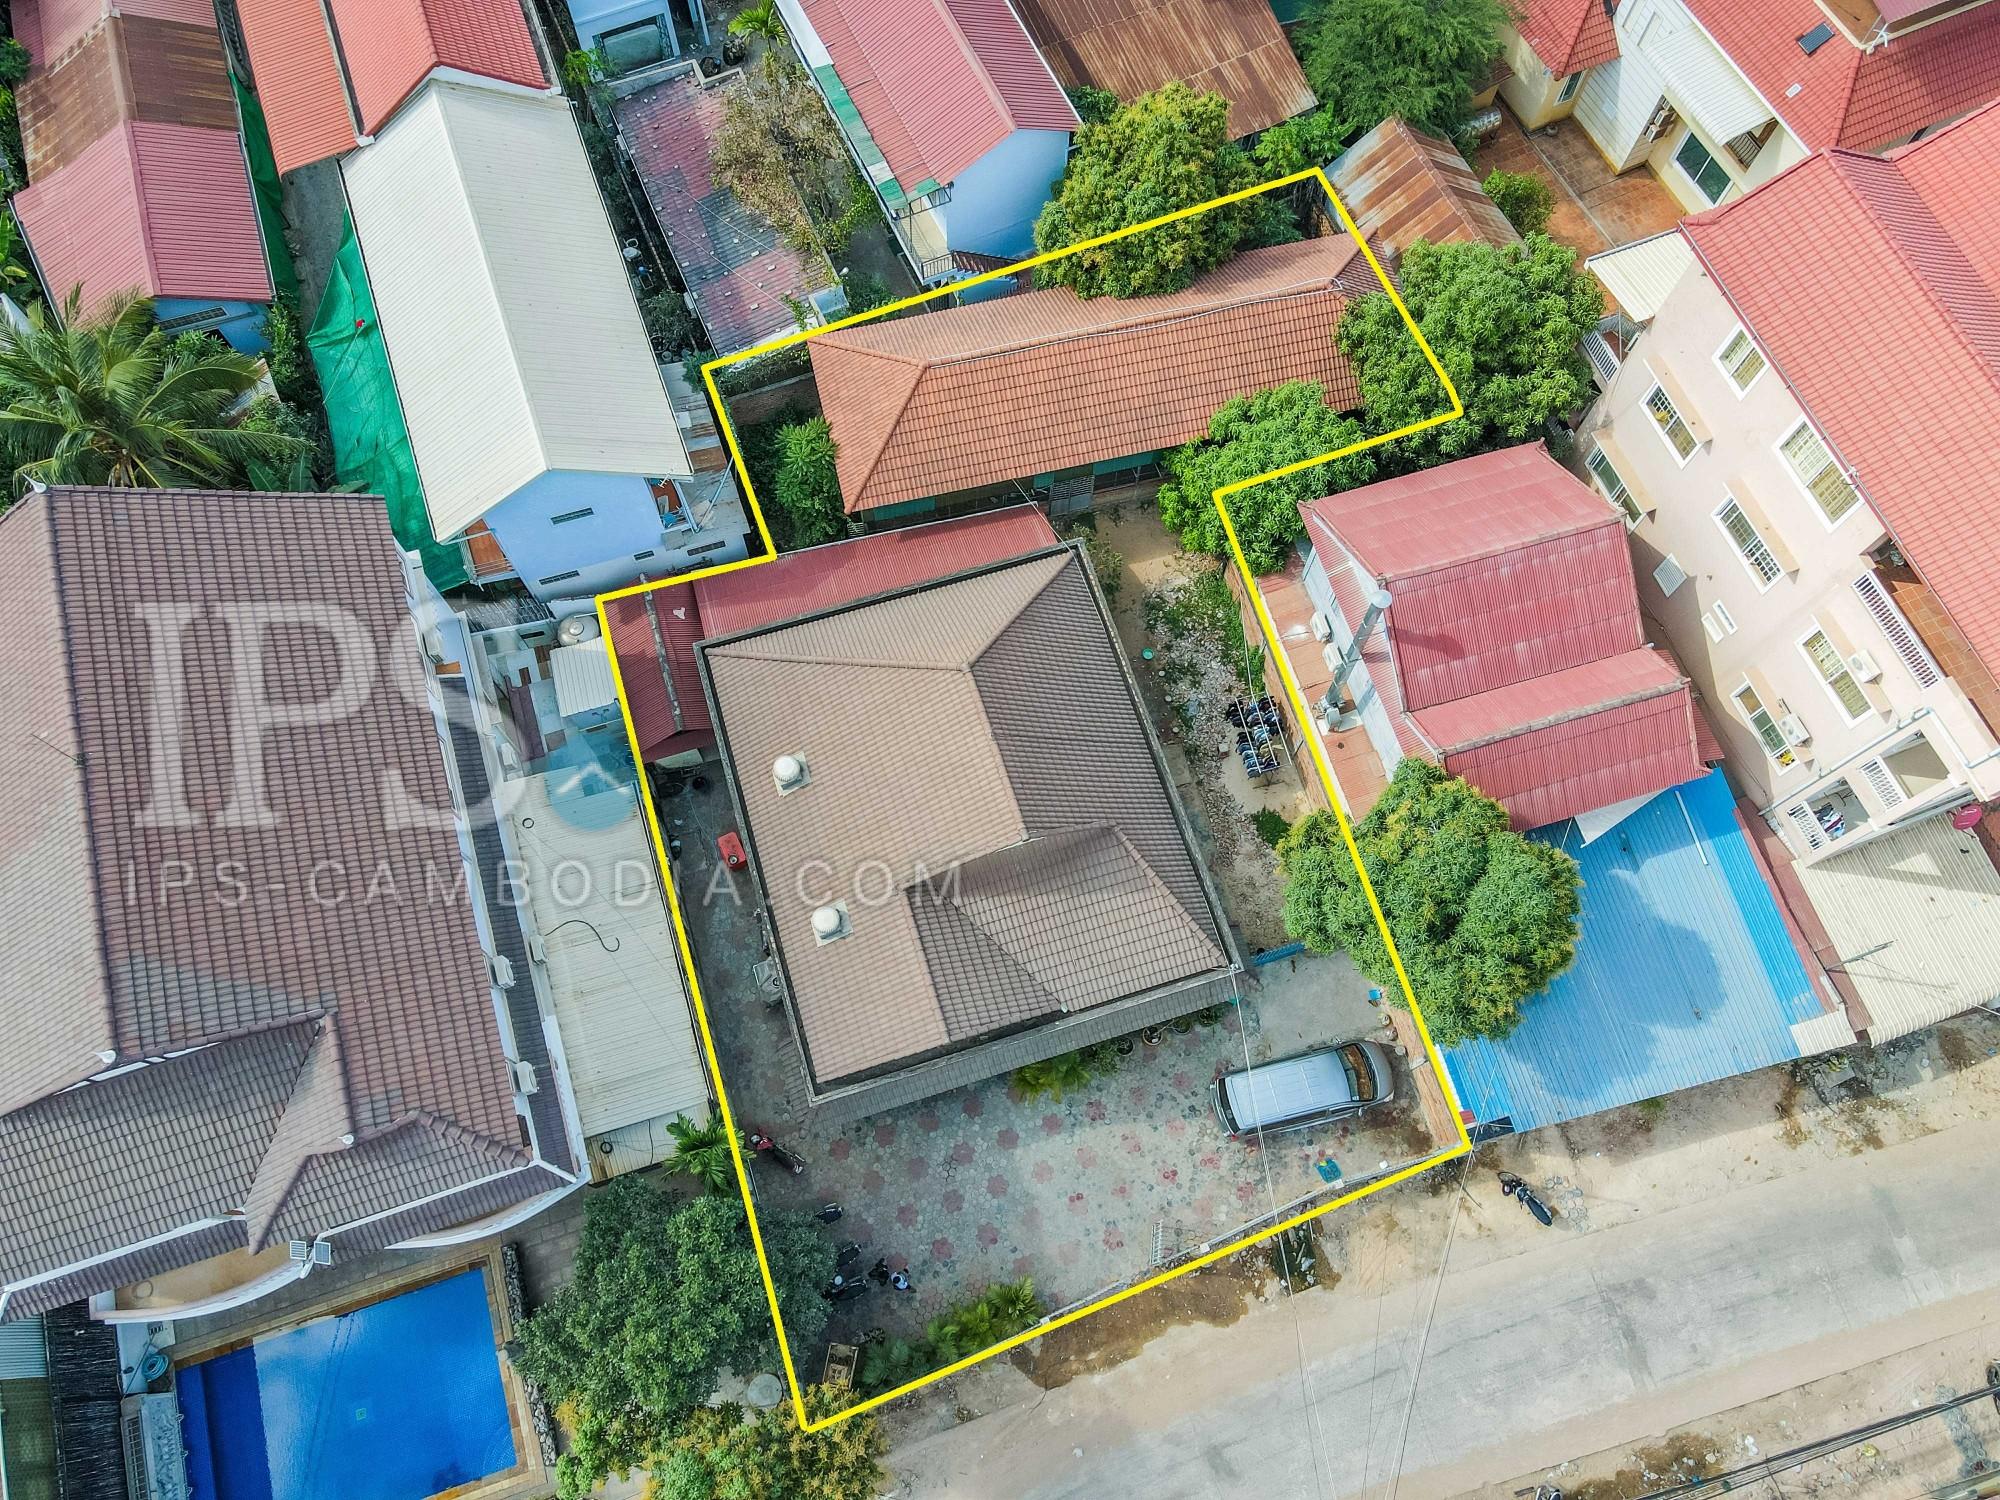 3 Bedroom House For Sale - Night Market Area, Siem Reap